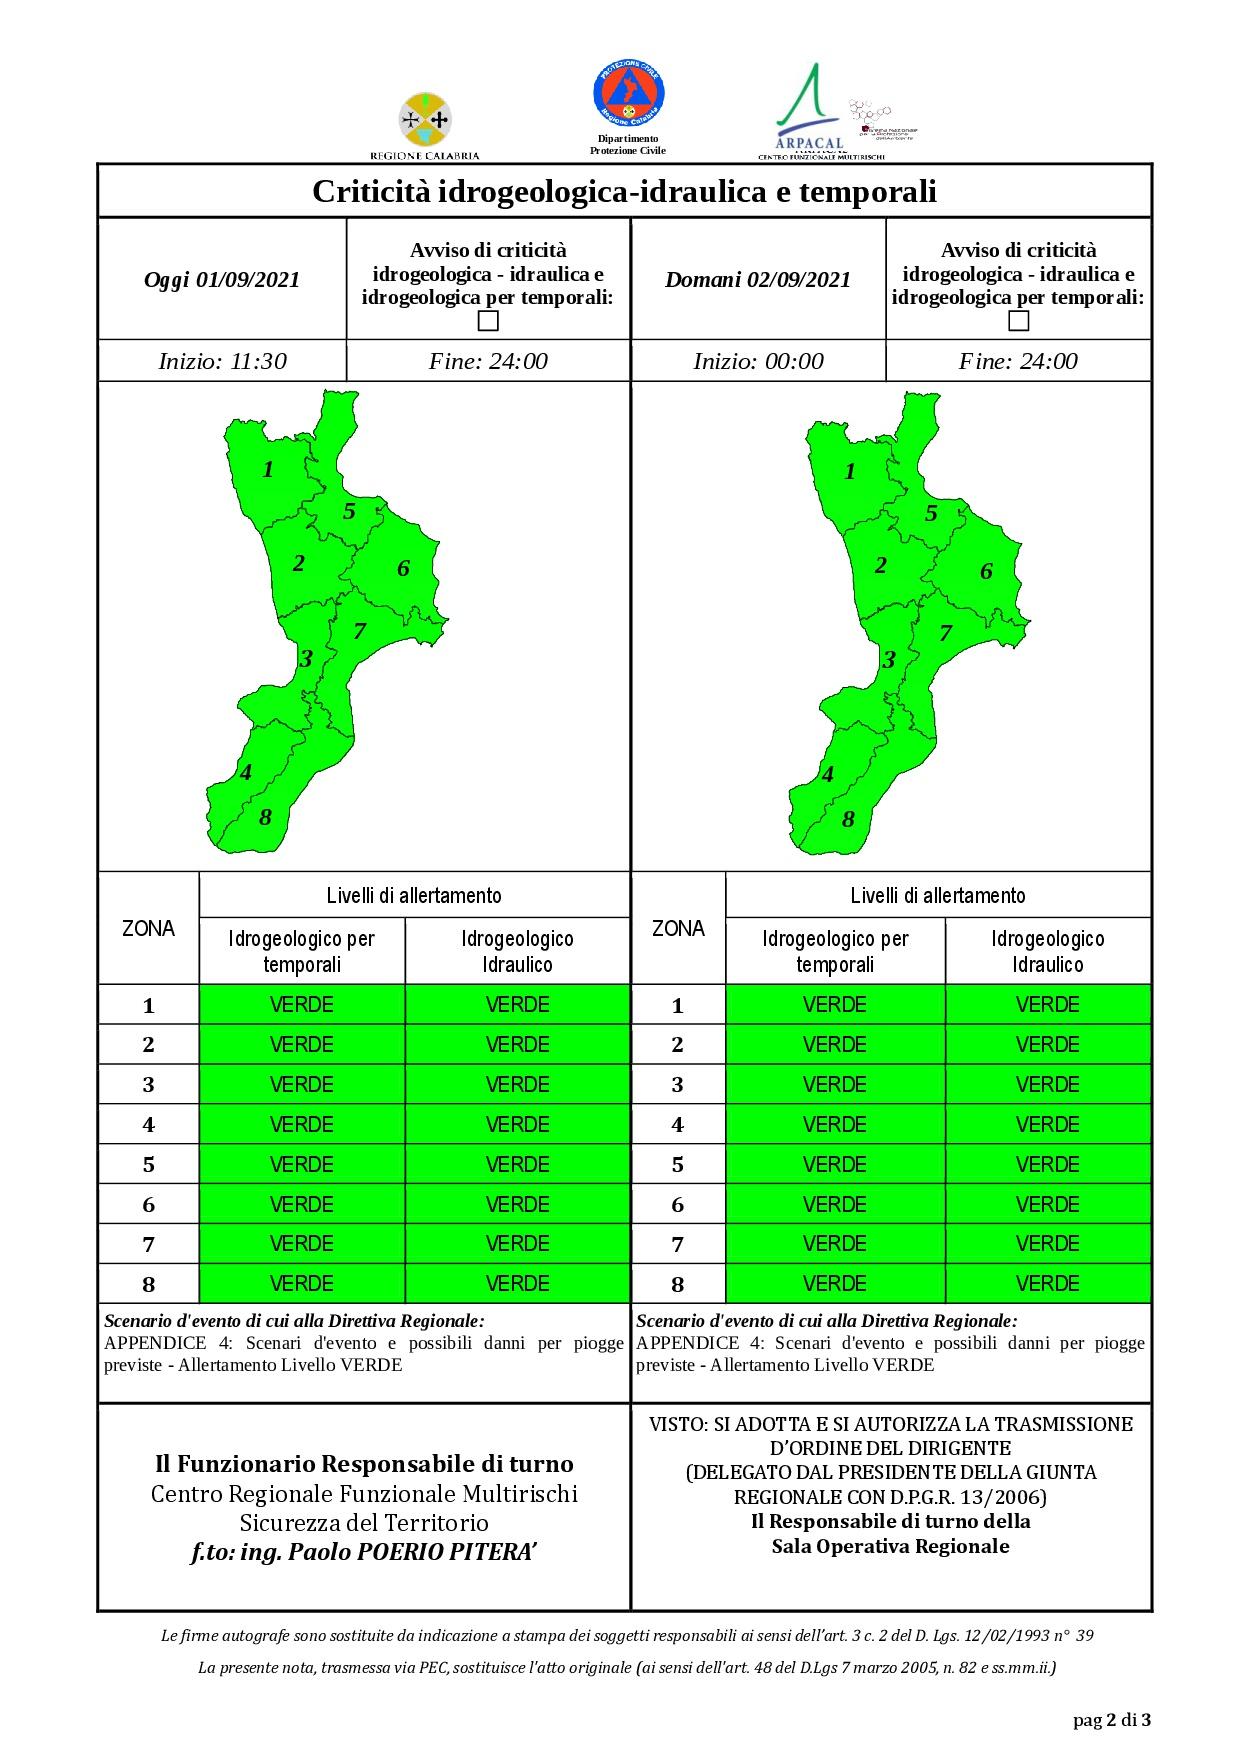 Criticità idrogeologica-idraulica e temporali in Calabria 01-09-2021